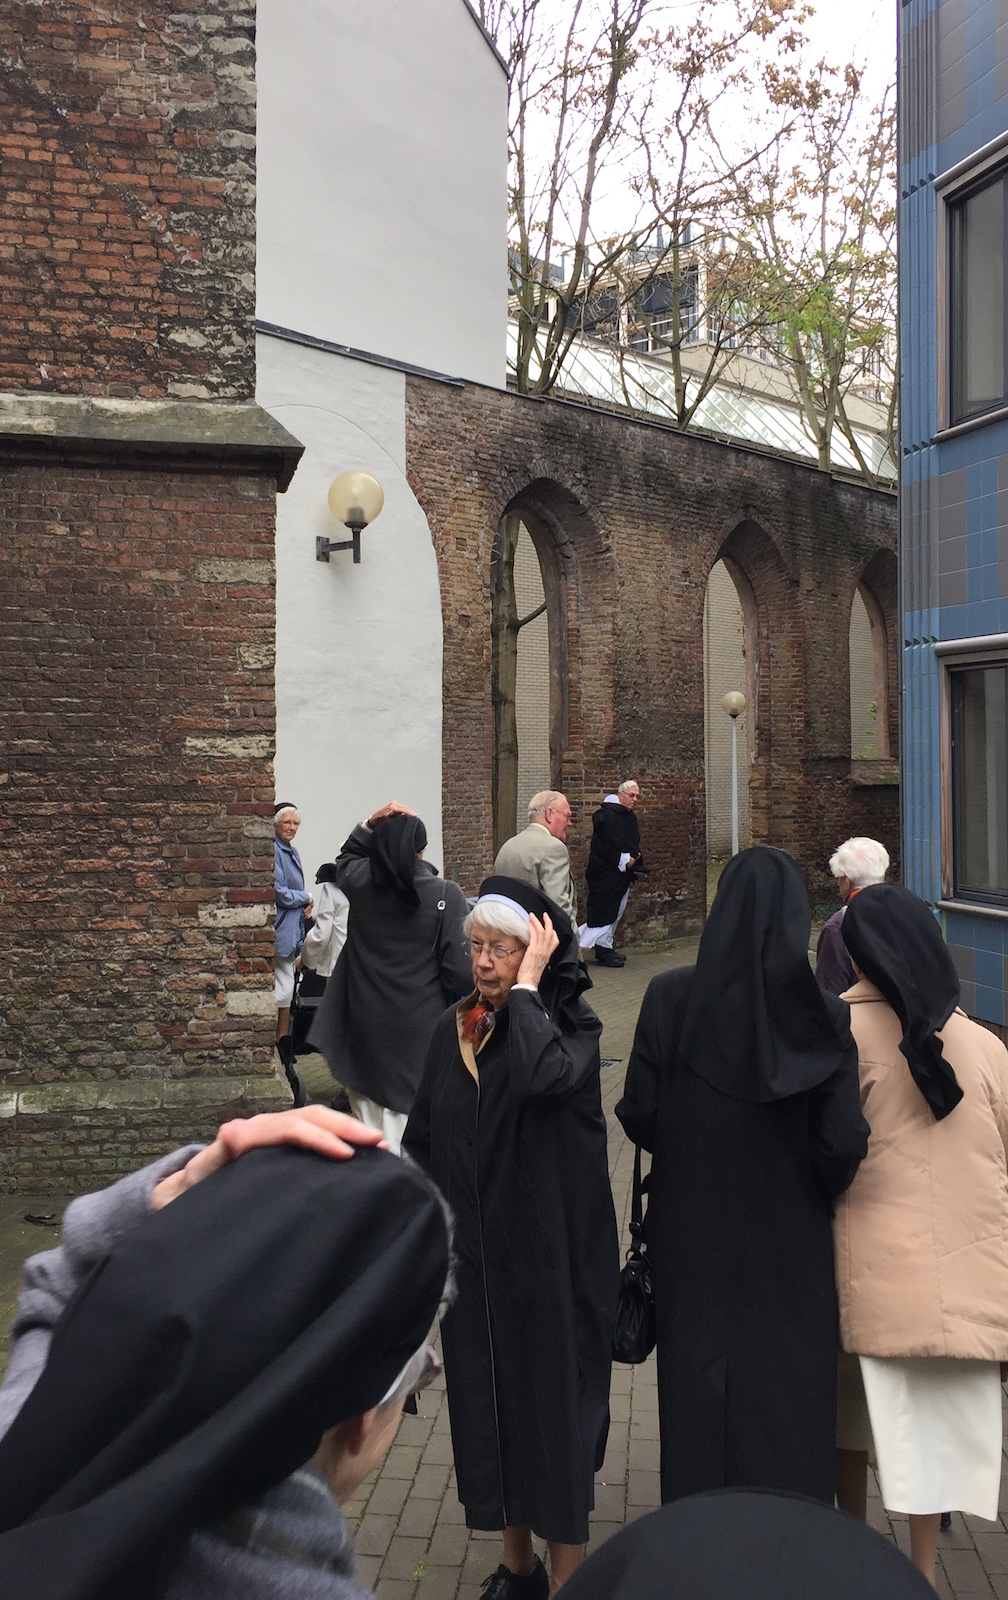 kloosterkerk den haag 22-10-2017-2